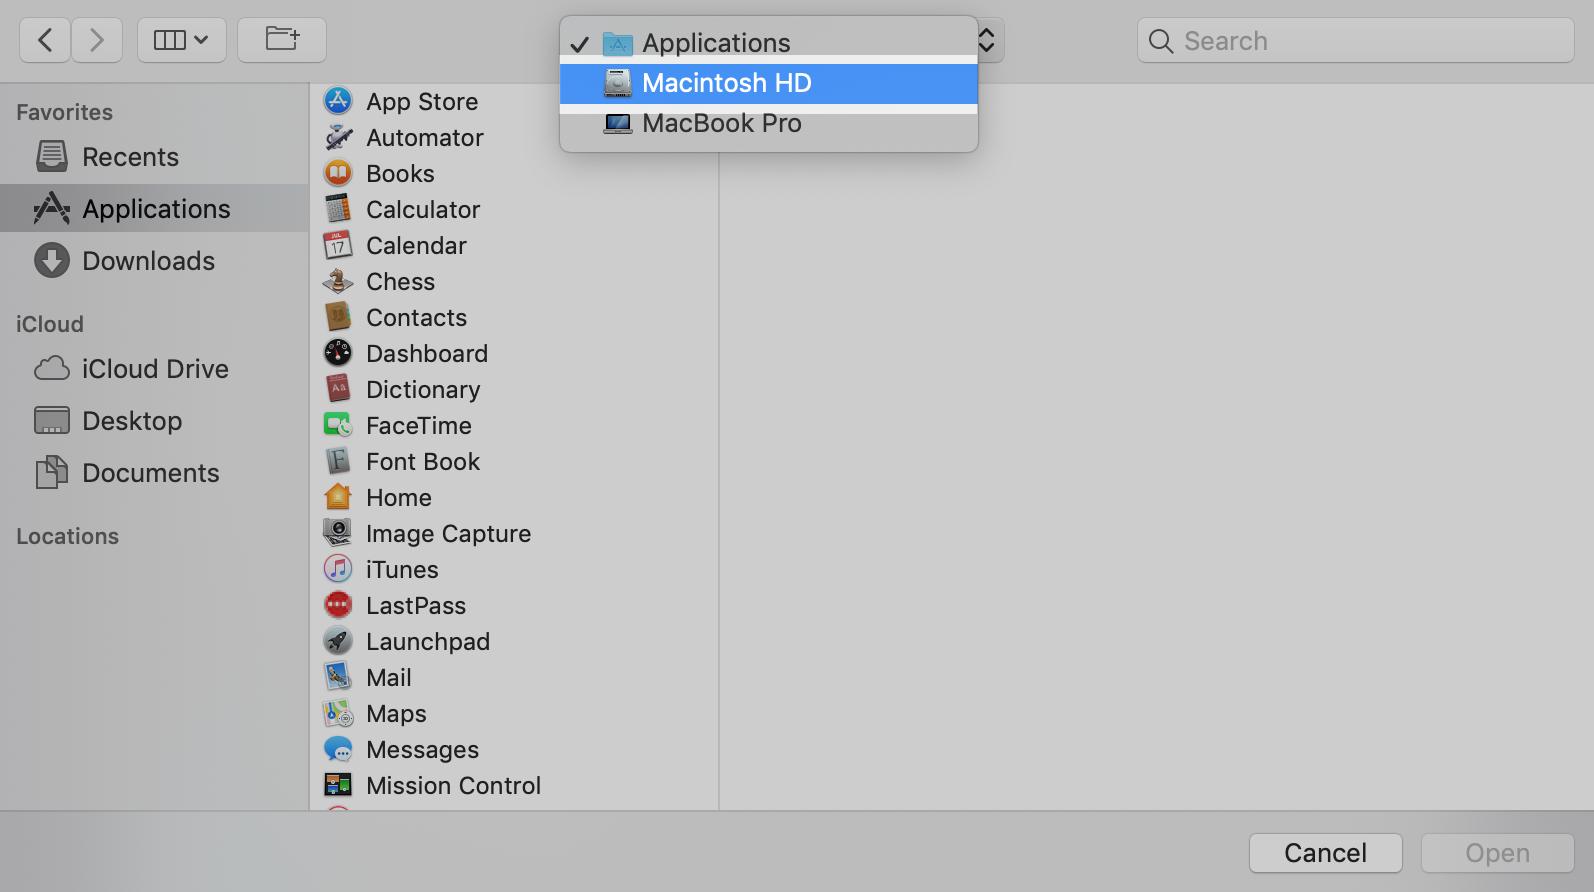 macOS Full Disk Access: Click the dropdown menu and select Macintosh HD